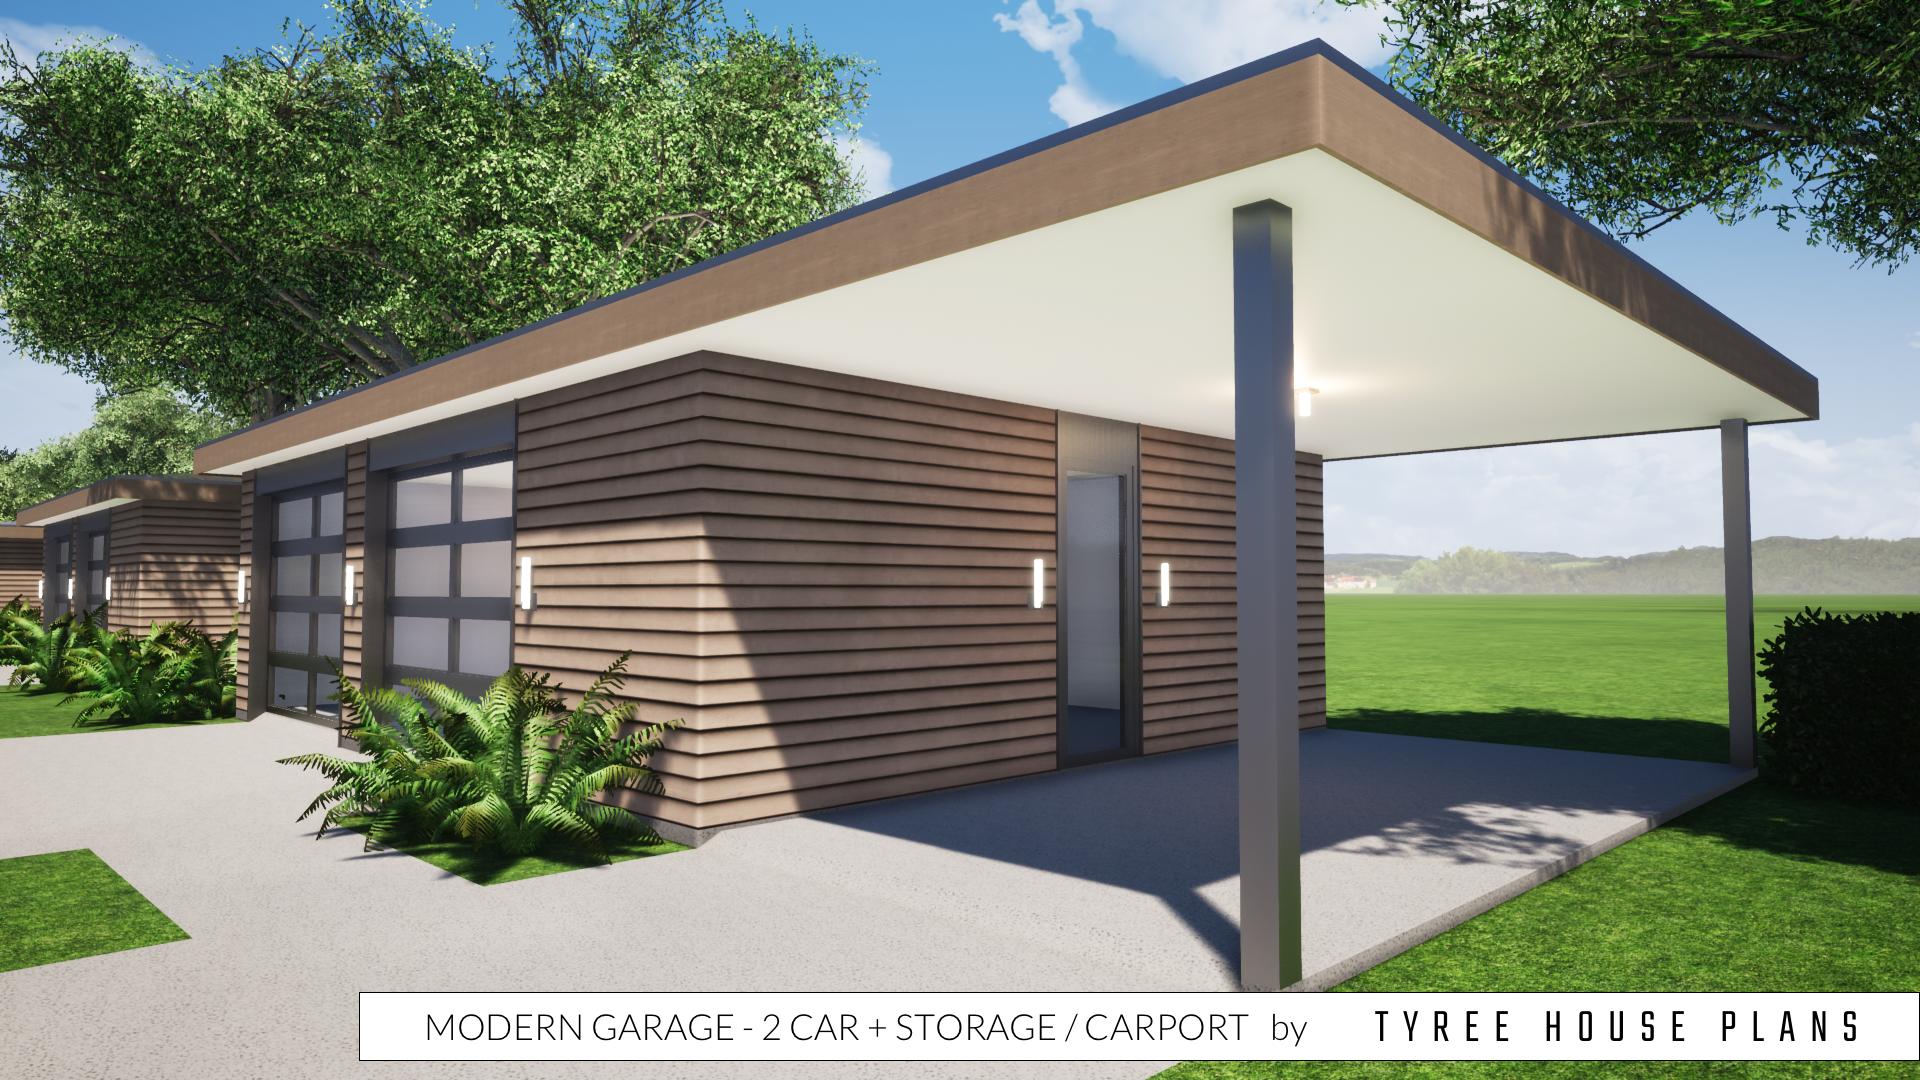 Modern Garage Plan 2 Car Plus Storage and Carport in